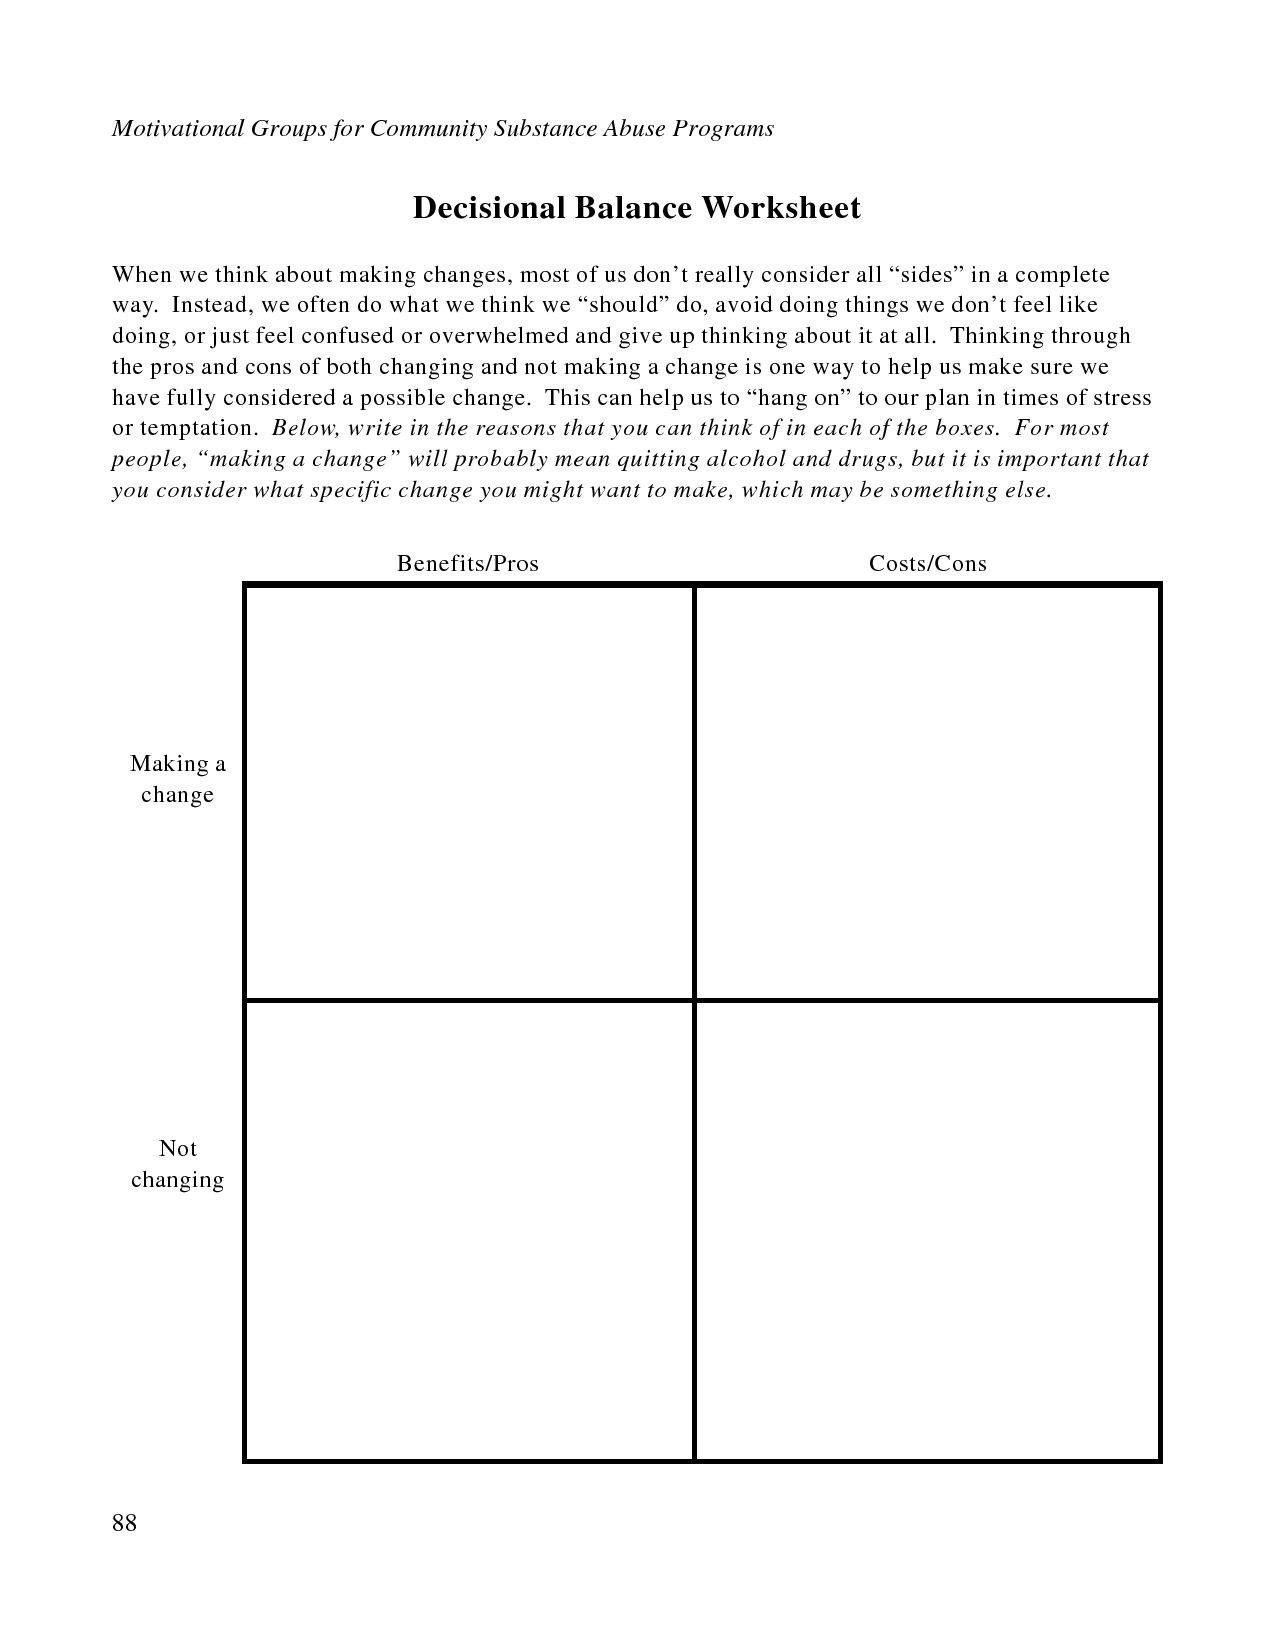 Free Printable Dbt Worksheets   Decisional Balance Worksheet - Pdf - Free Printable Therapy Worksheets